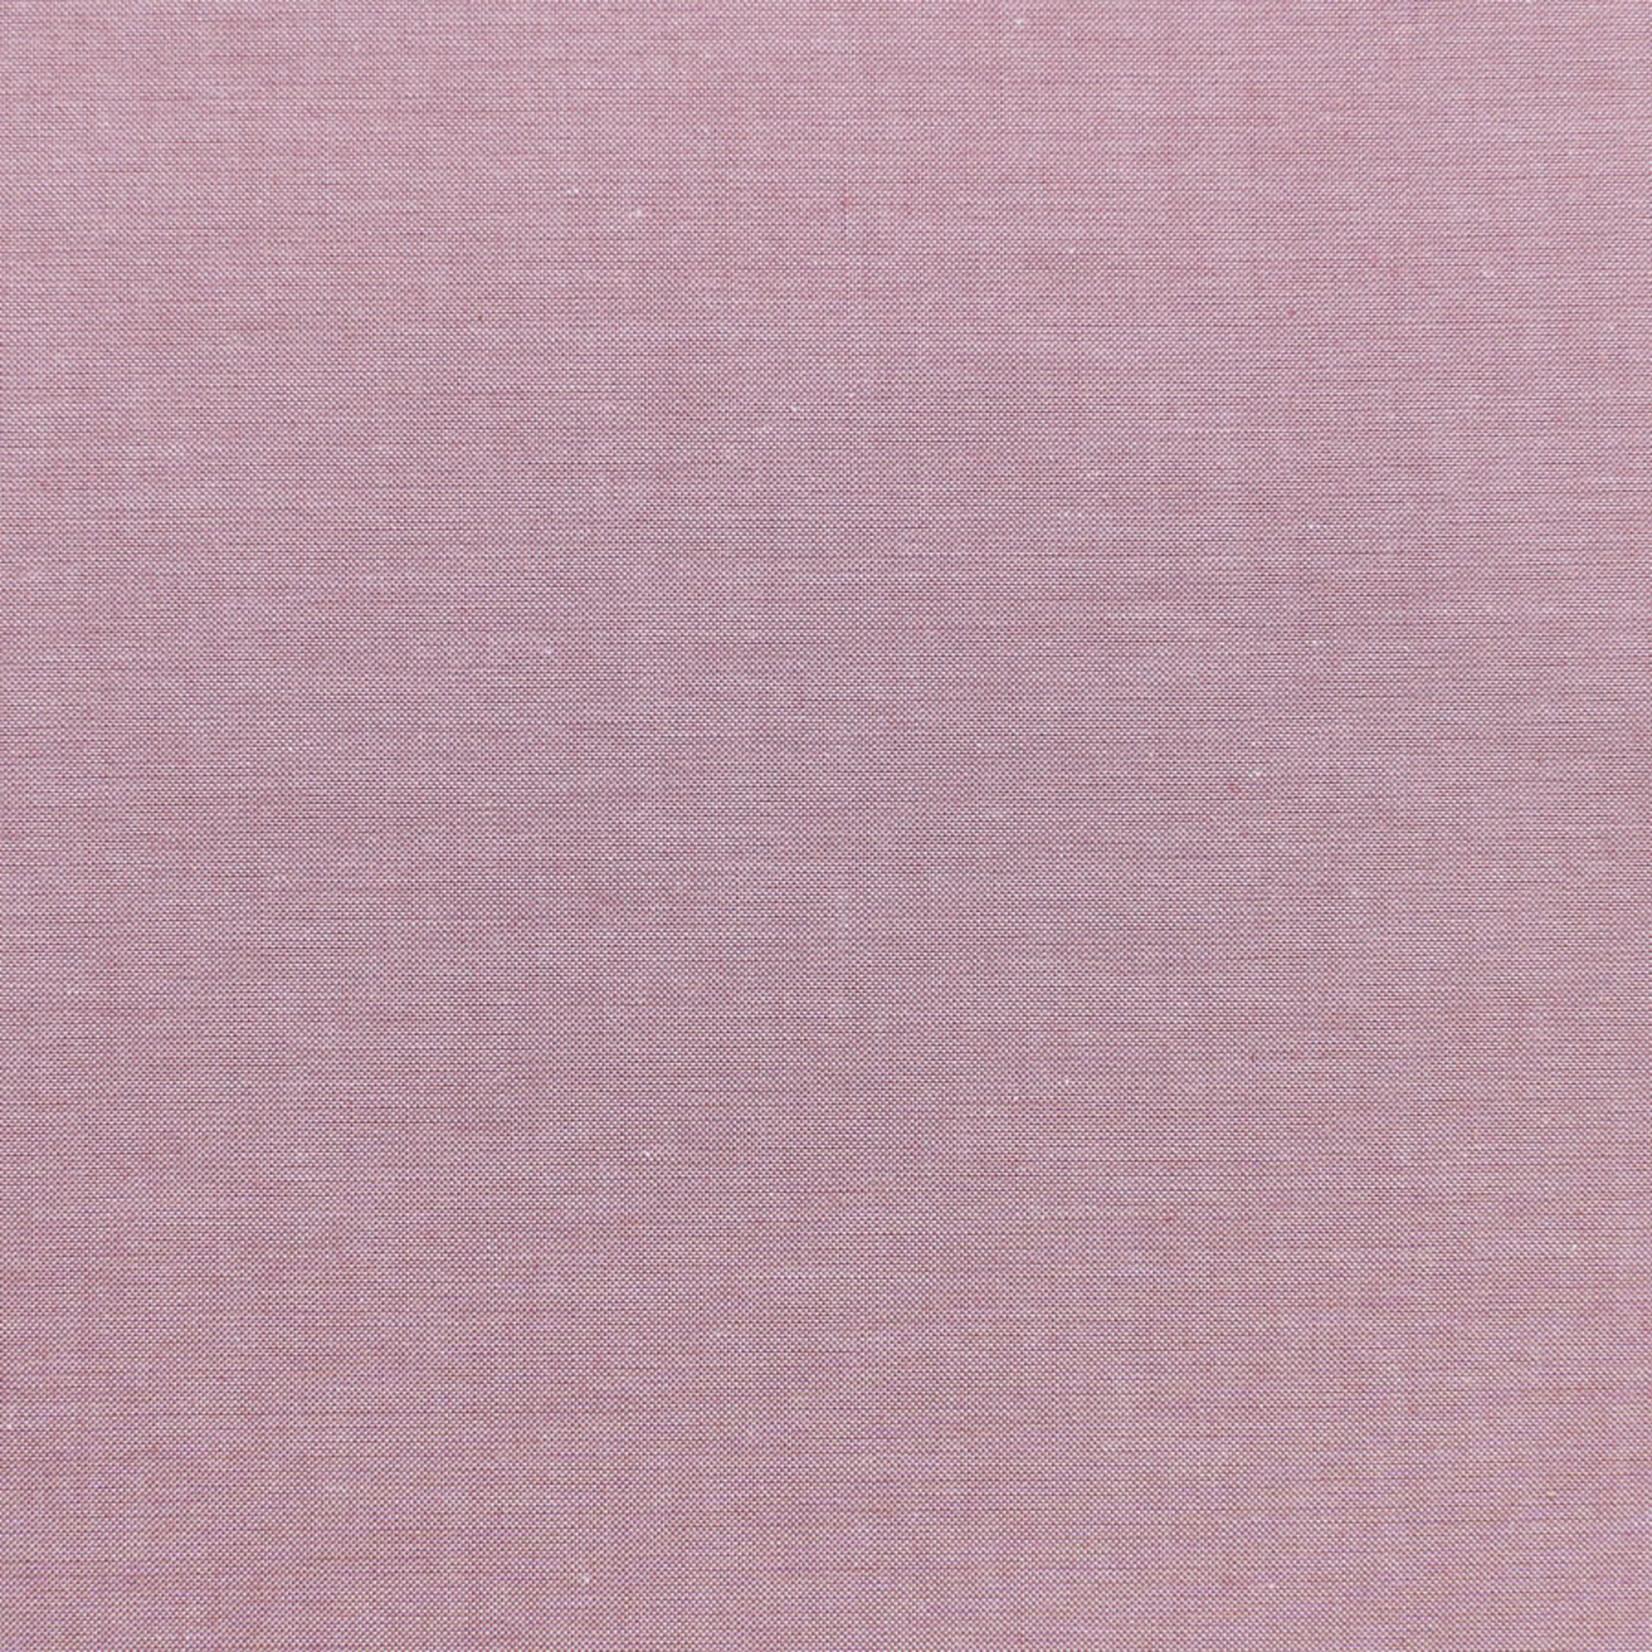 Tilda Tilda Basics, Chambray, Blush 160002 $0.22 per cm or $22/m